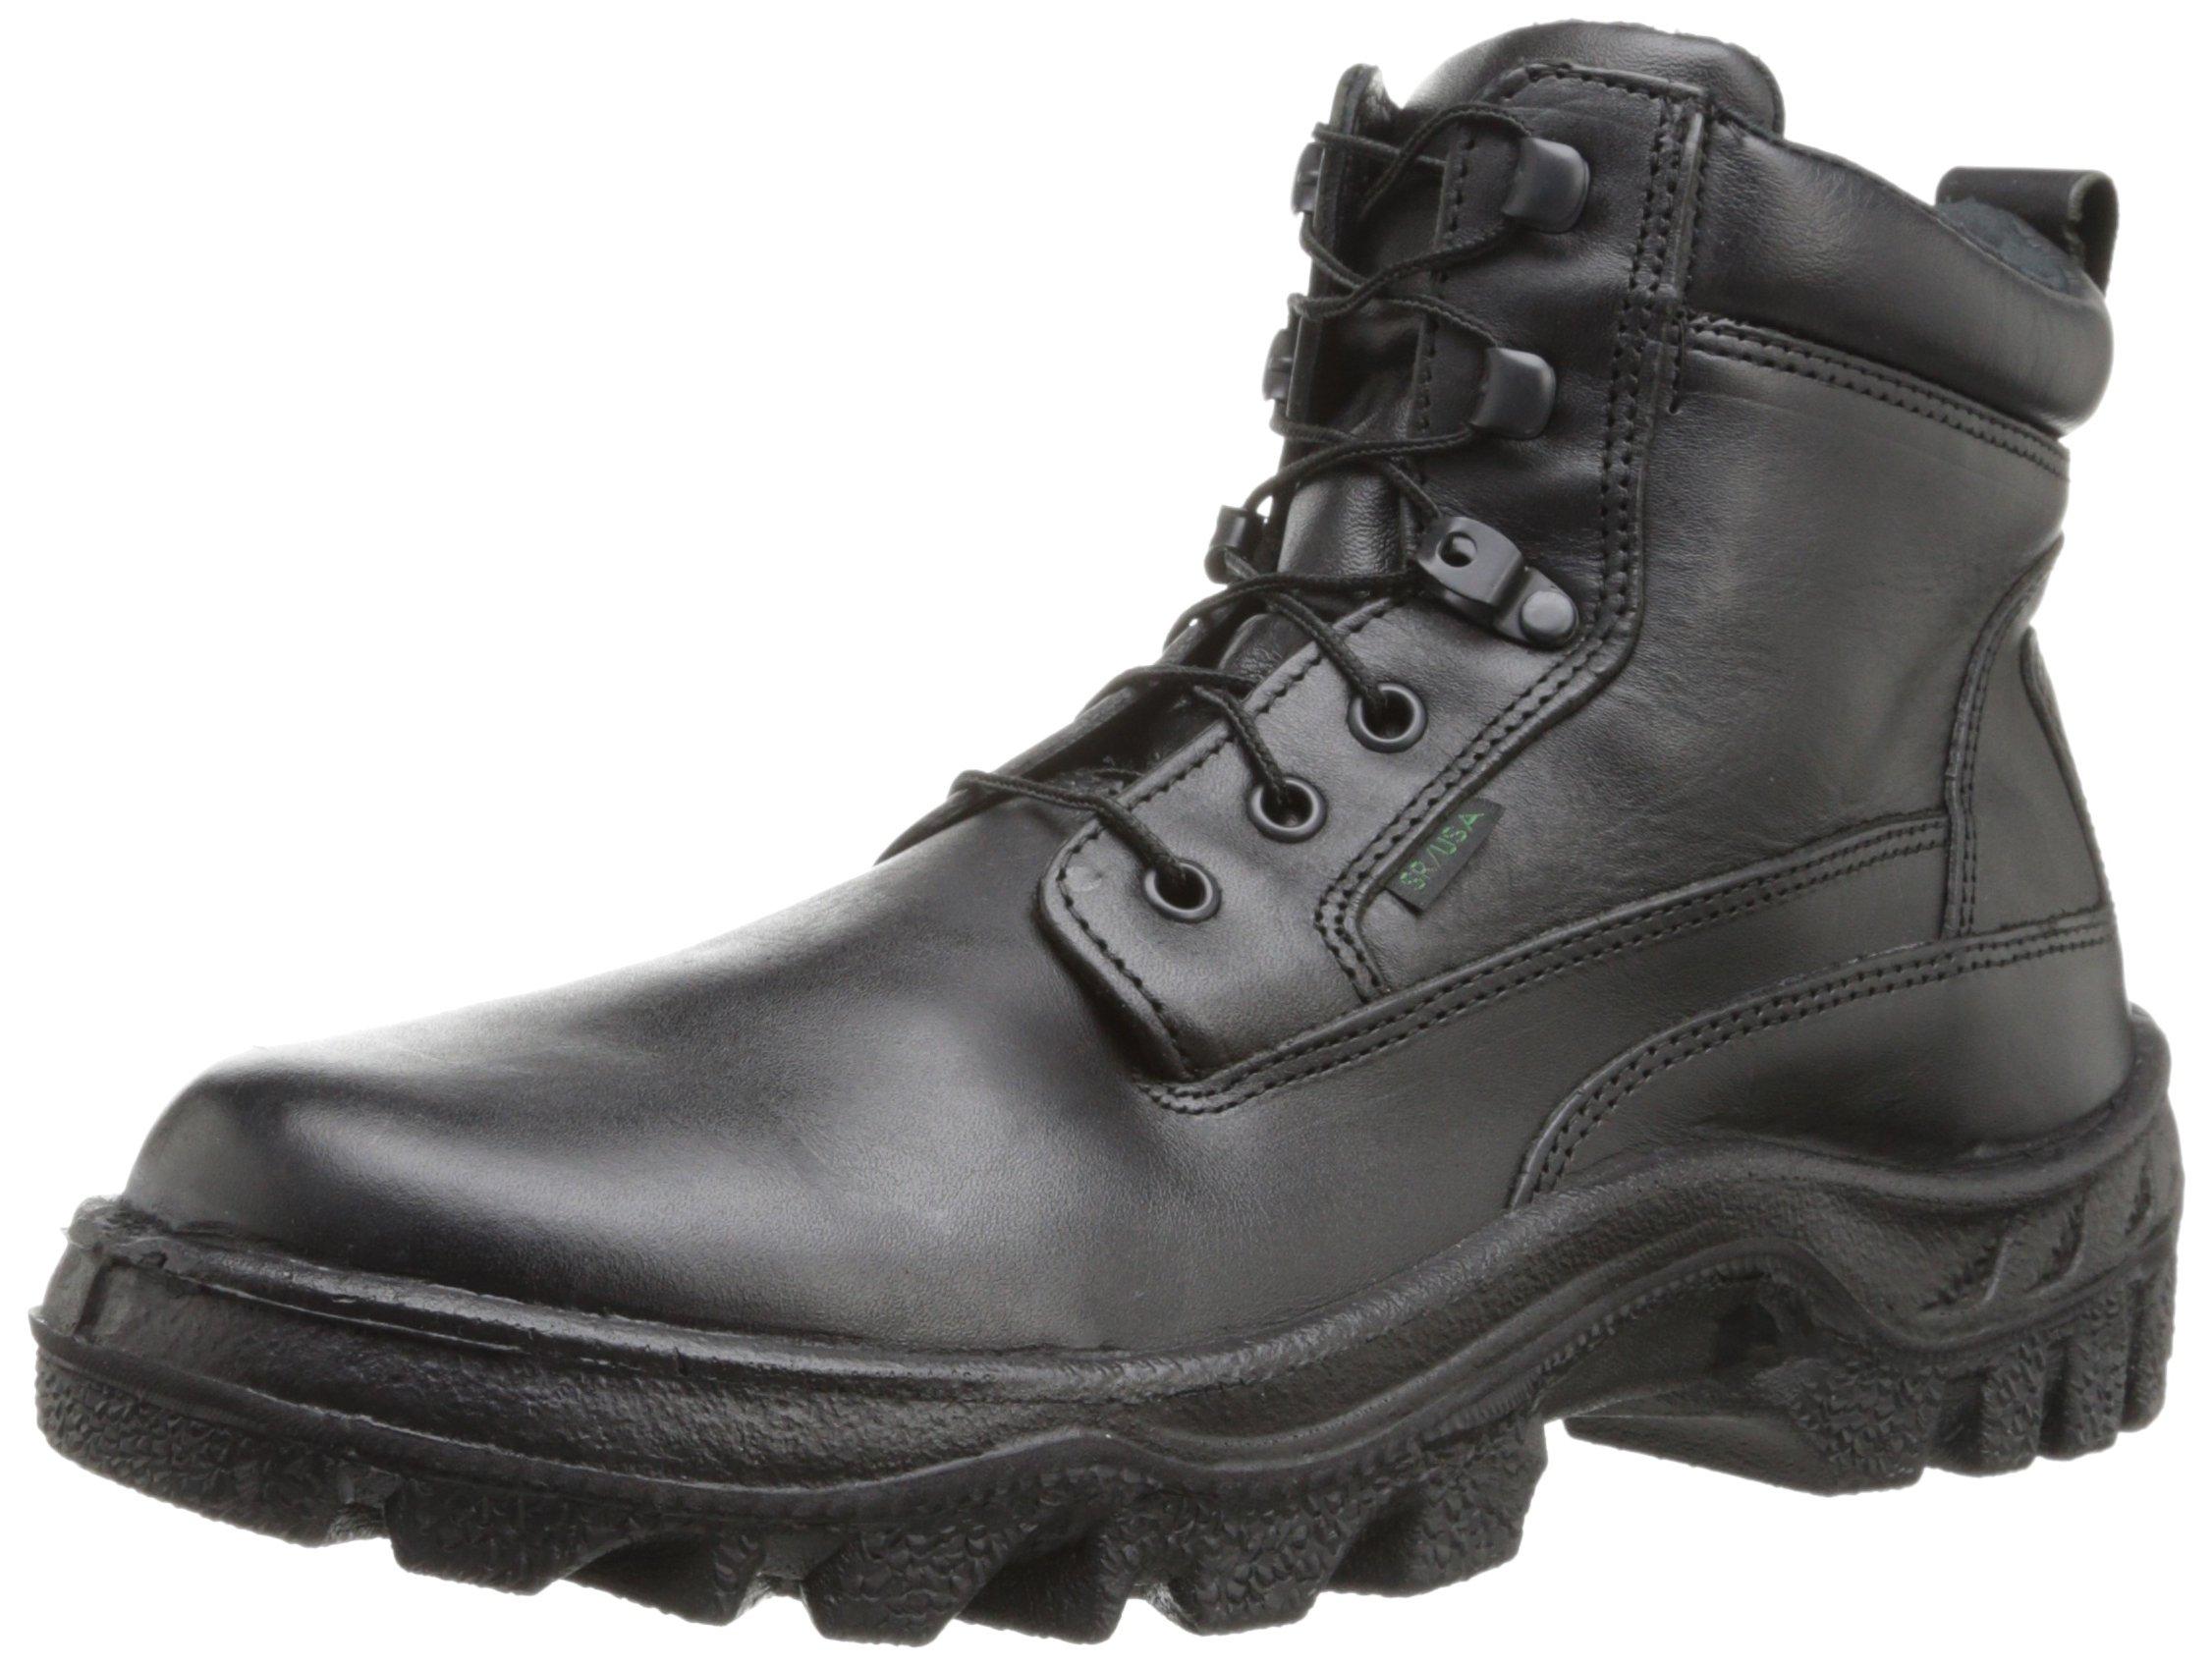 Rocky Men's Postal TMC 6 Inch Plain Toe Work Boot,Black,7.5 W US